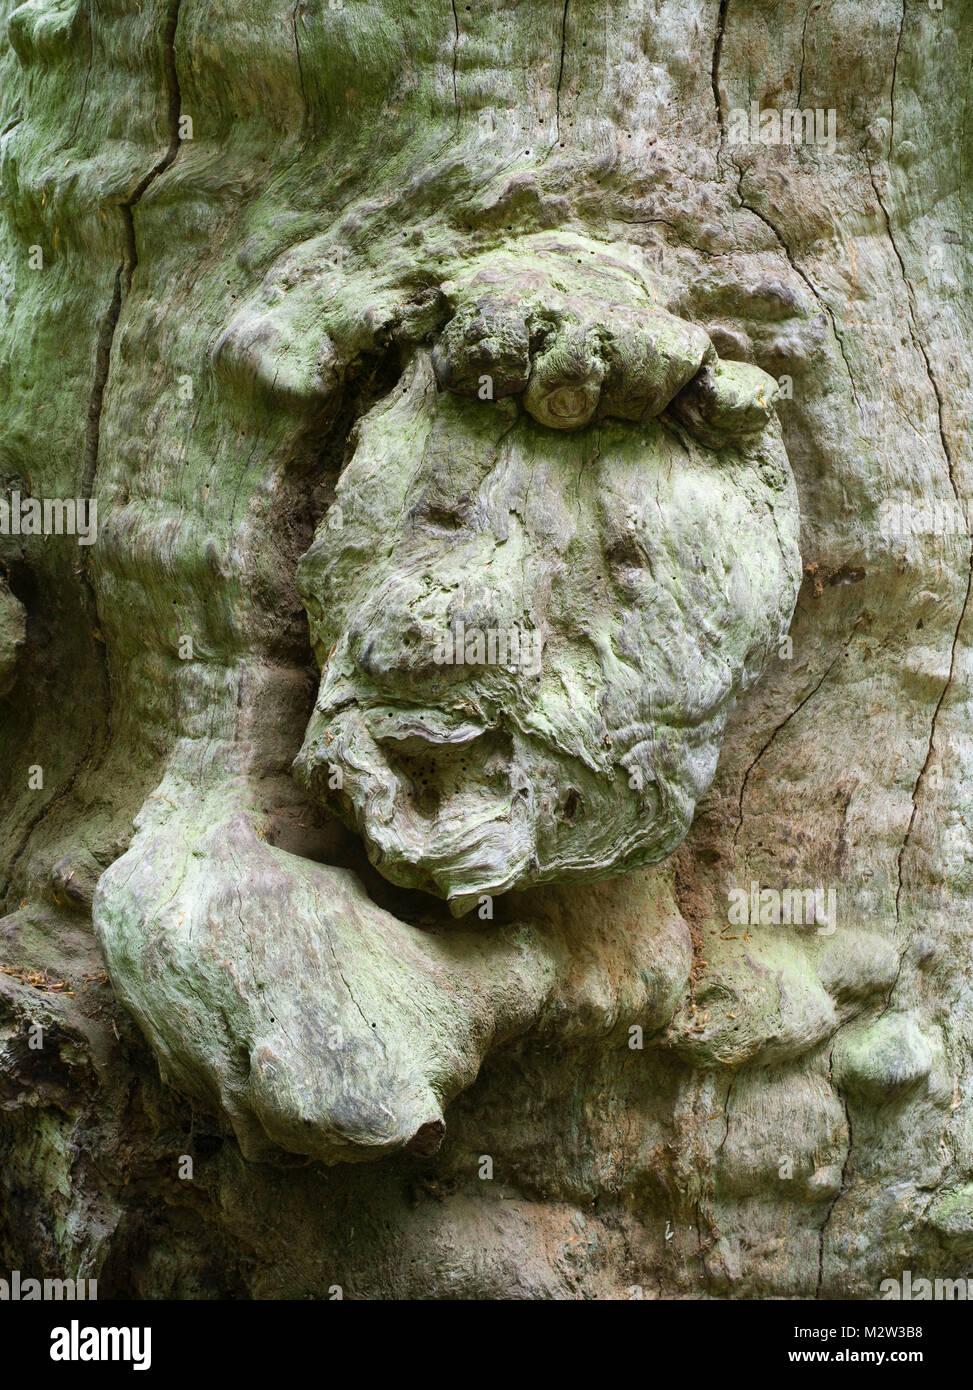 forest spirit, tree face in old beech, Urwald Sababurg, Reinhardswald, Hessia, Germany - Stock Image